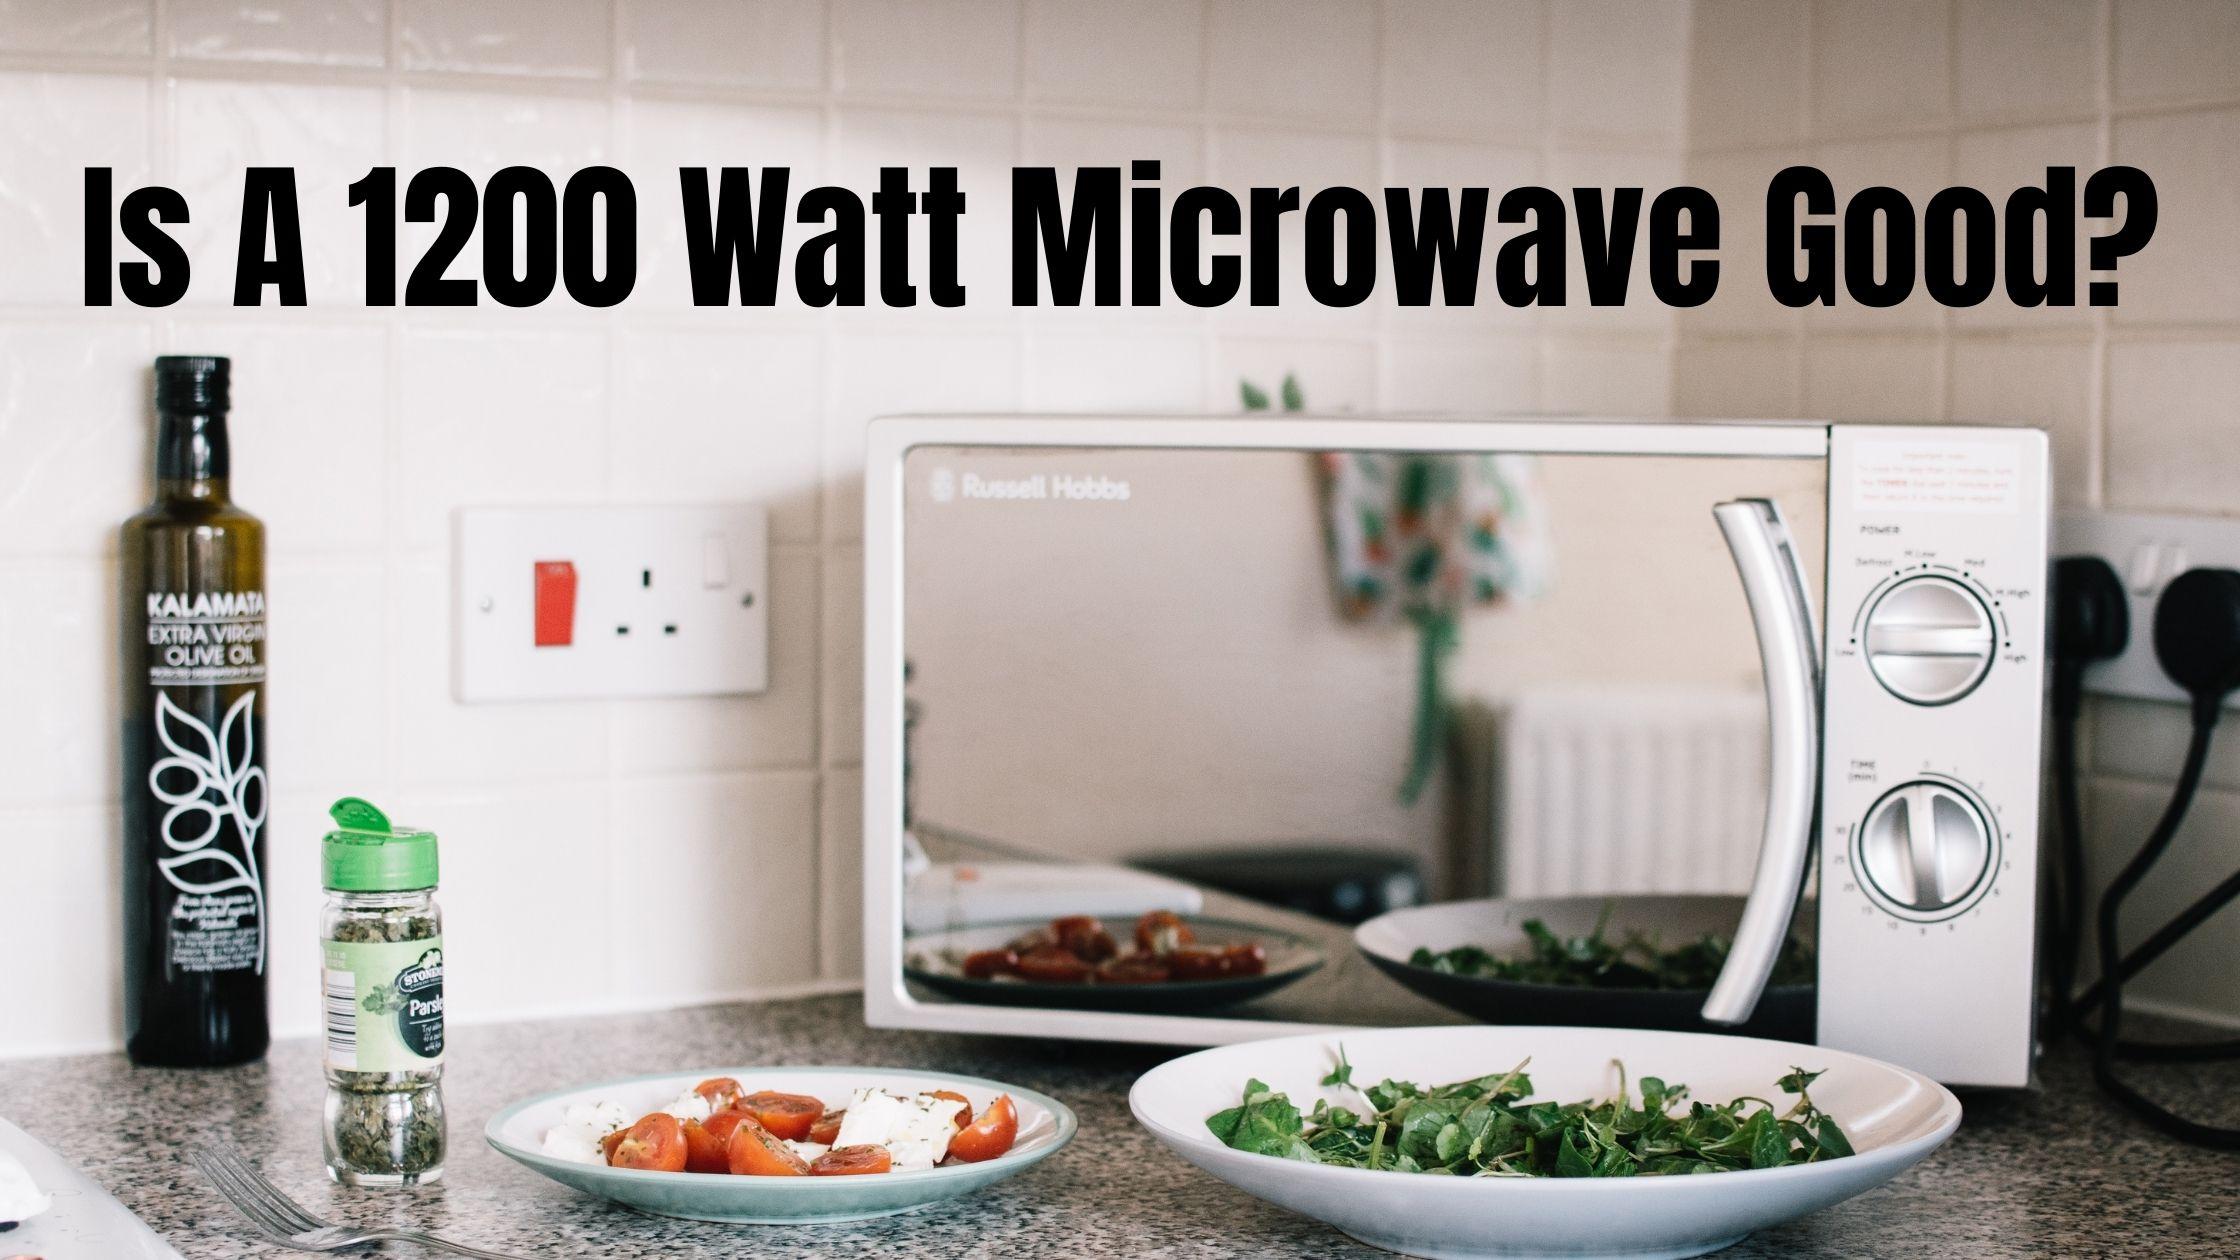 Is A 1200 Watt Microwave Good